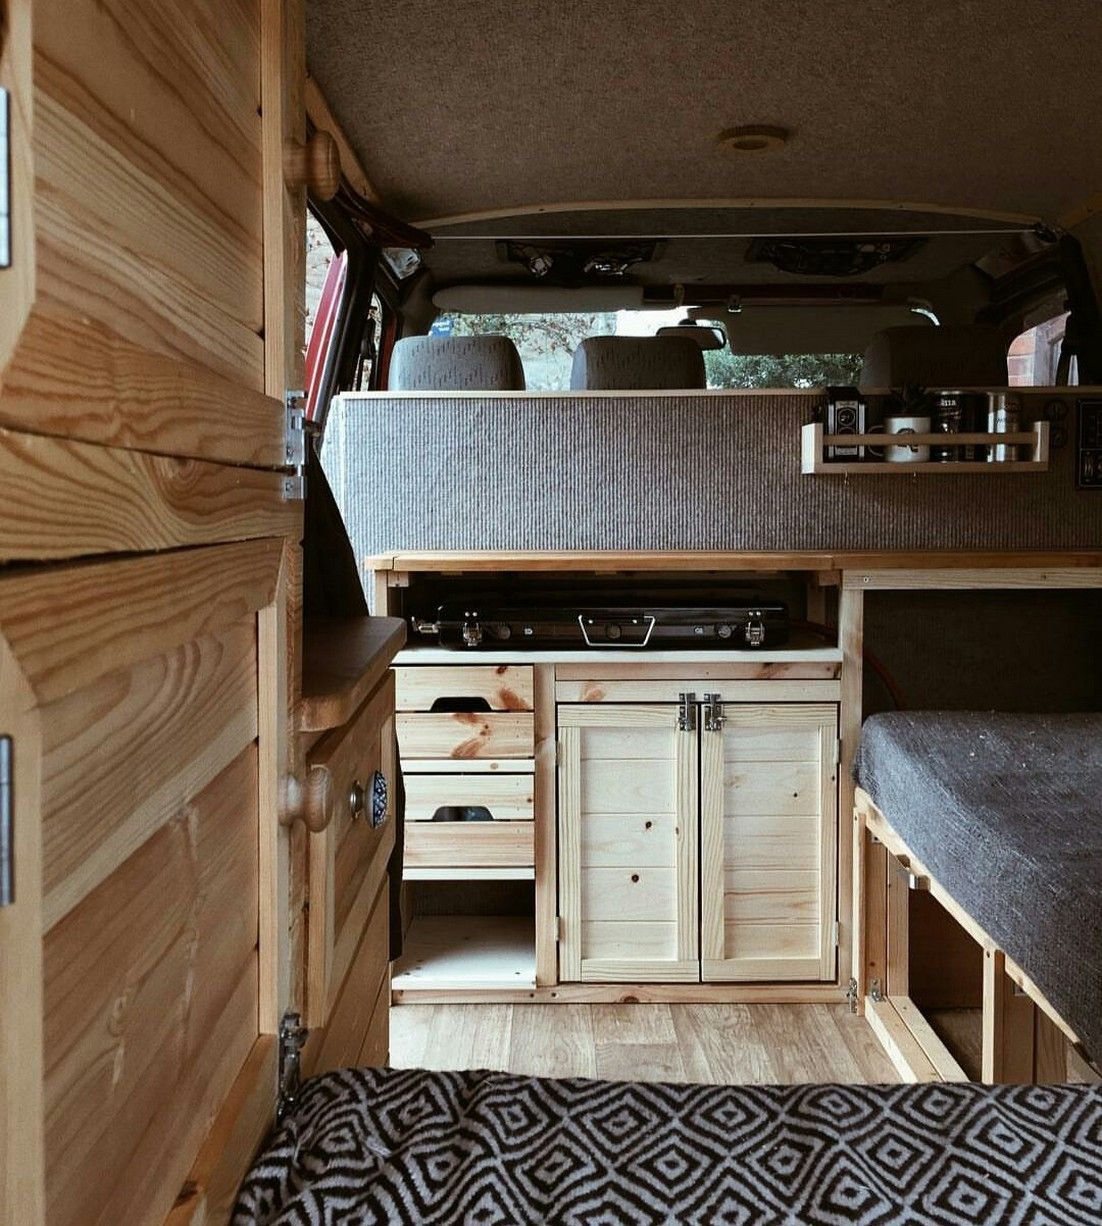 90 Awesome Painting Camper Rv Cabinets Ideas Manlikemarvinsparks Com Motorhome Interior Van Interior Campervan Interior